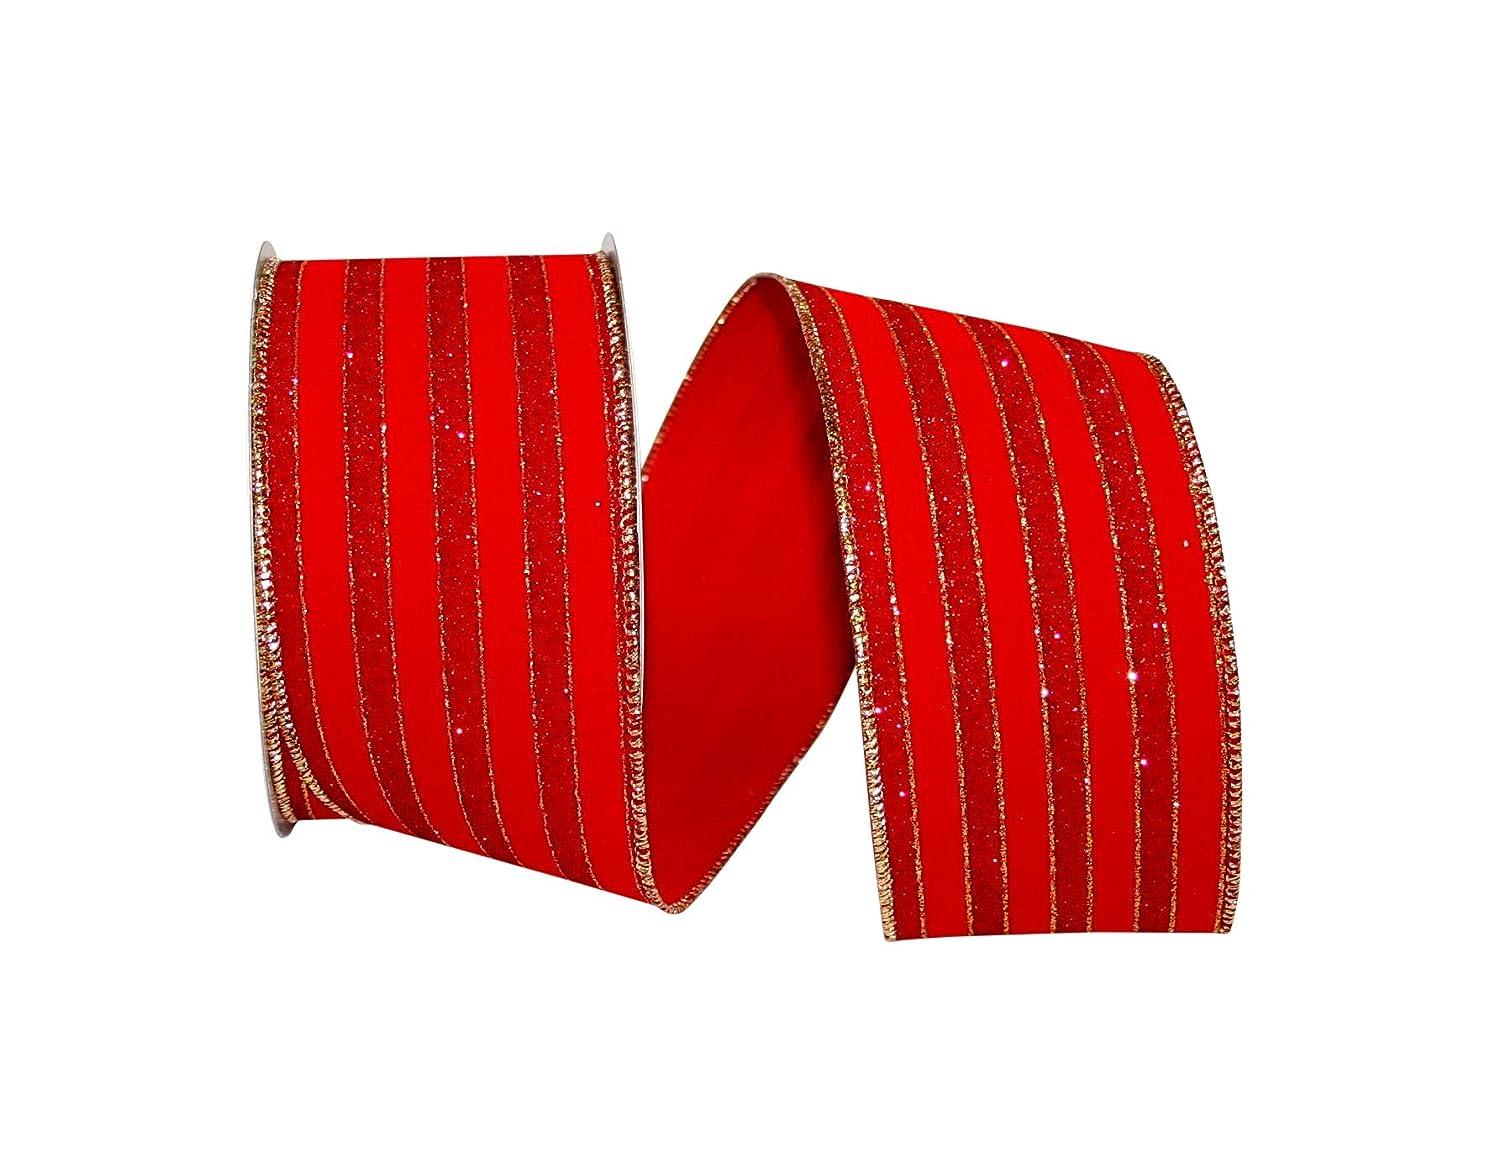 Reliant Ribbon 92892W-065-40F Glitter Stripe Velvet Wired Edge Ribbon, 2-1/2 Inch X 10 Yards, Red